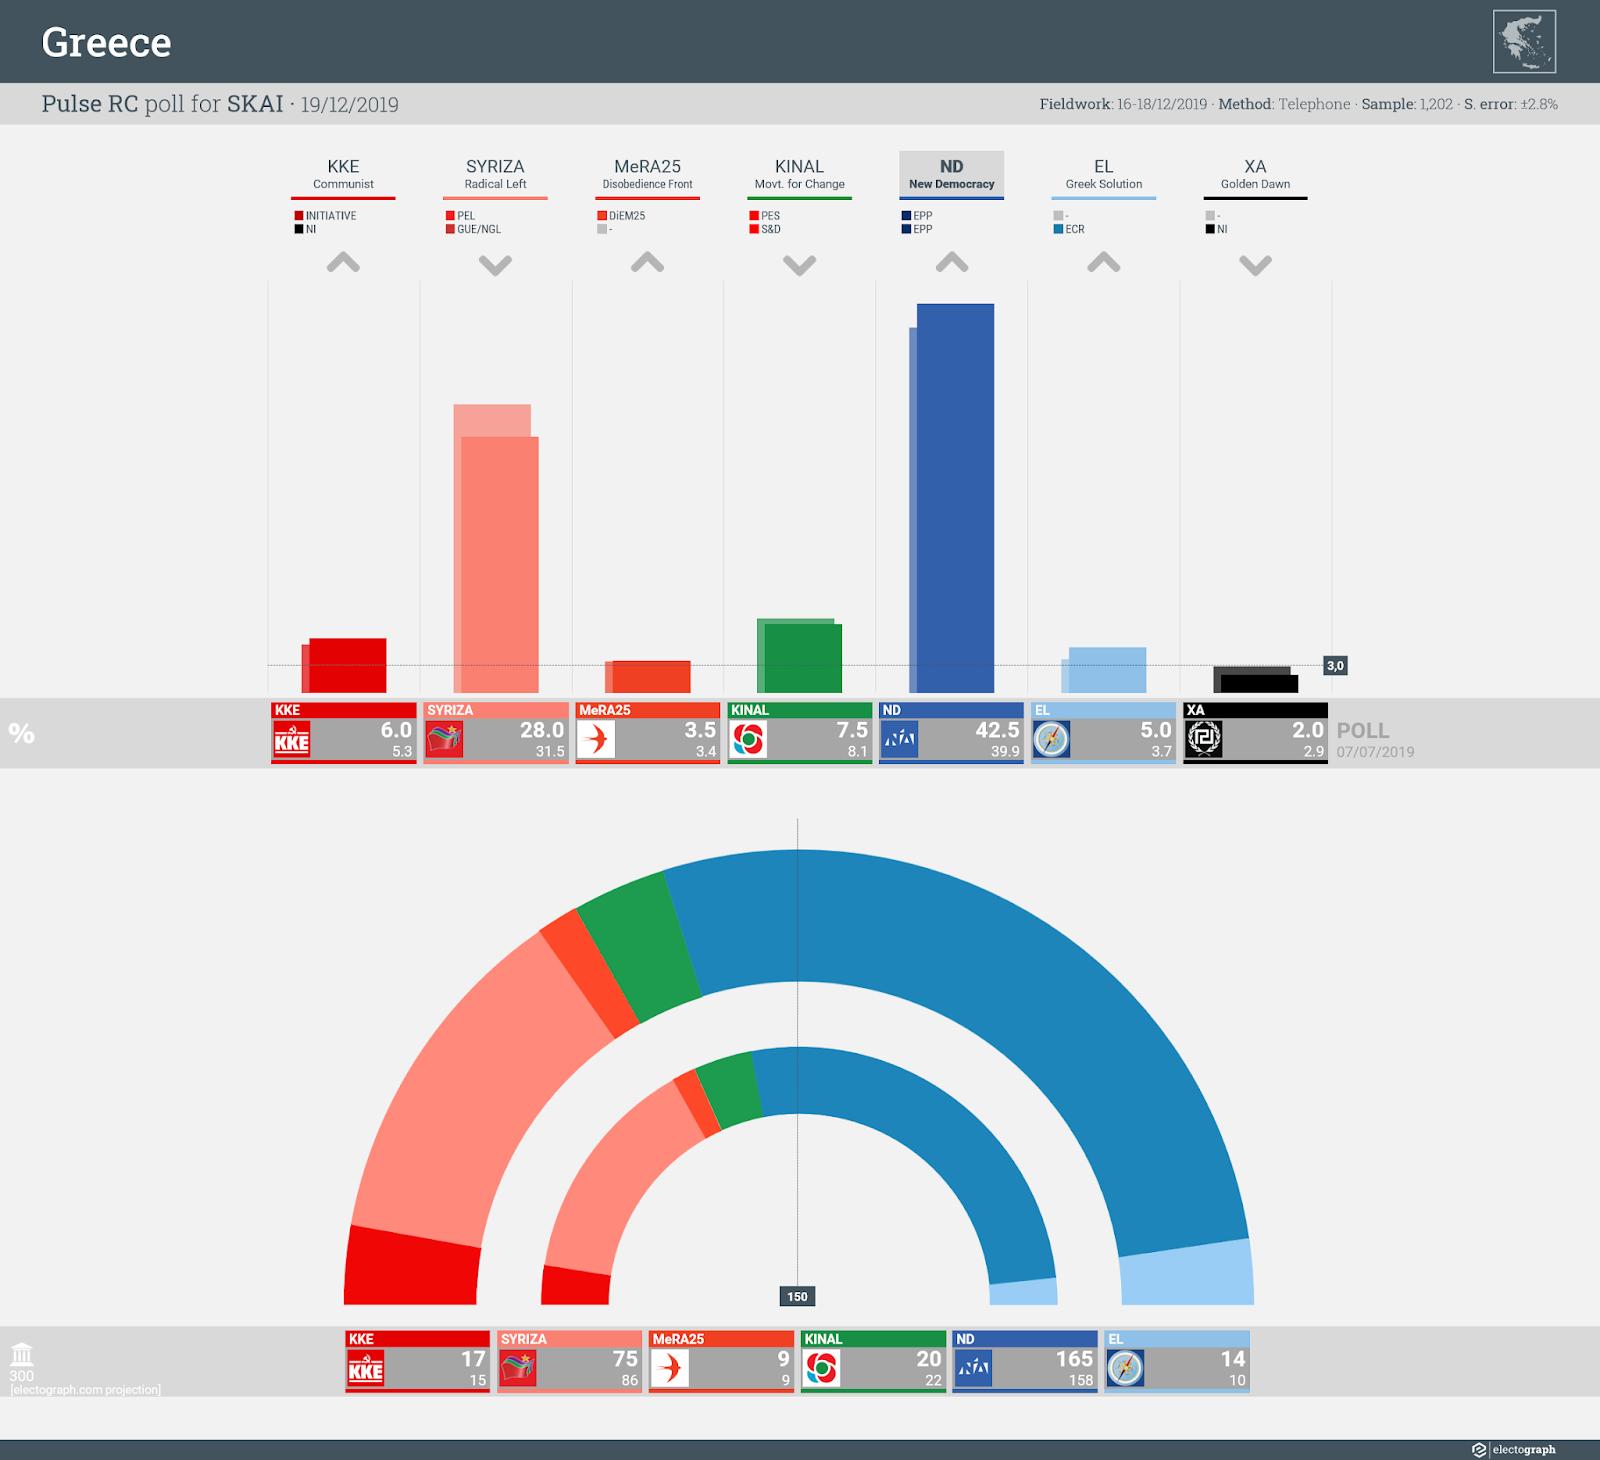 GREECE: Pulse RC poll chart for SKAI, 19 December 2019